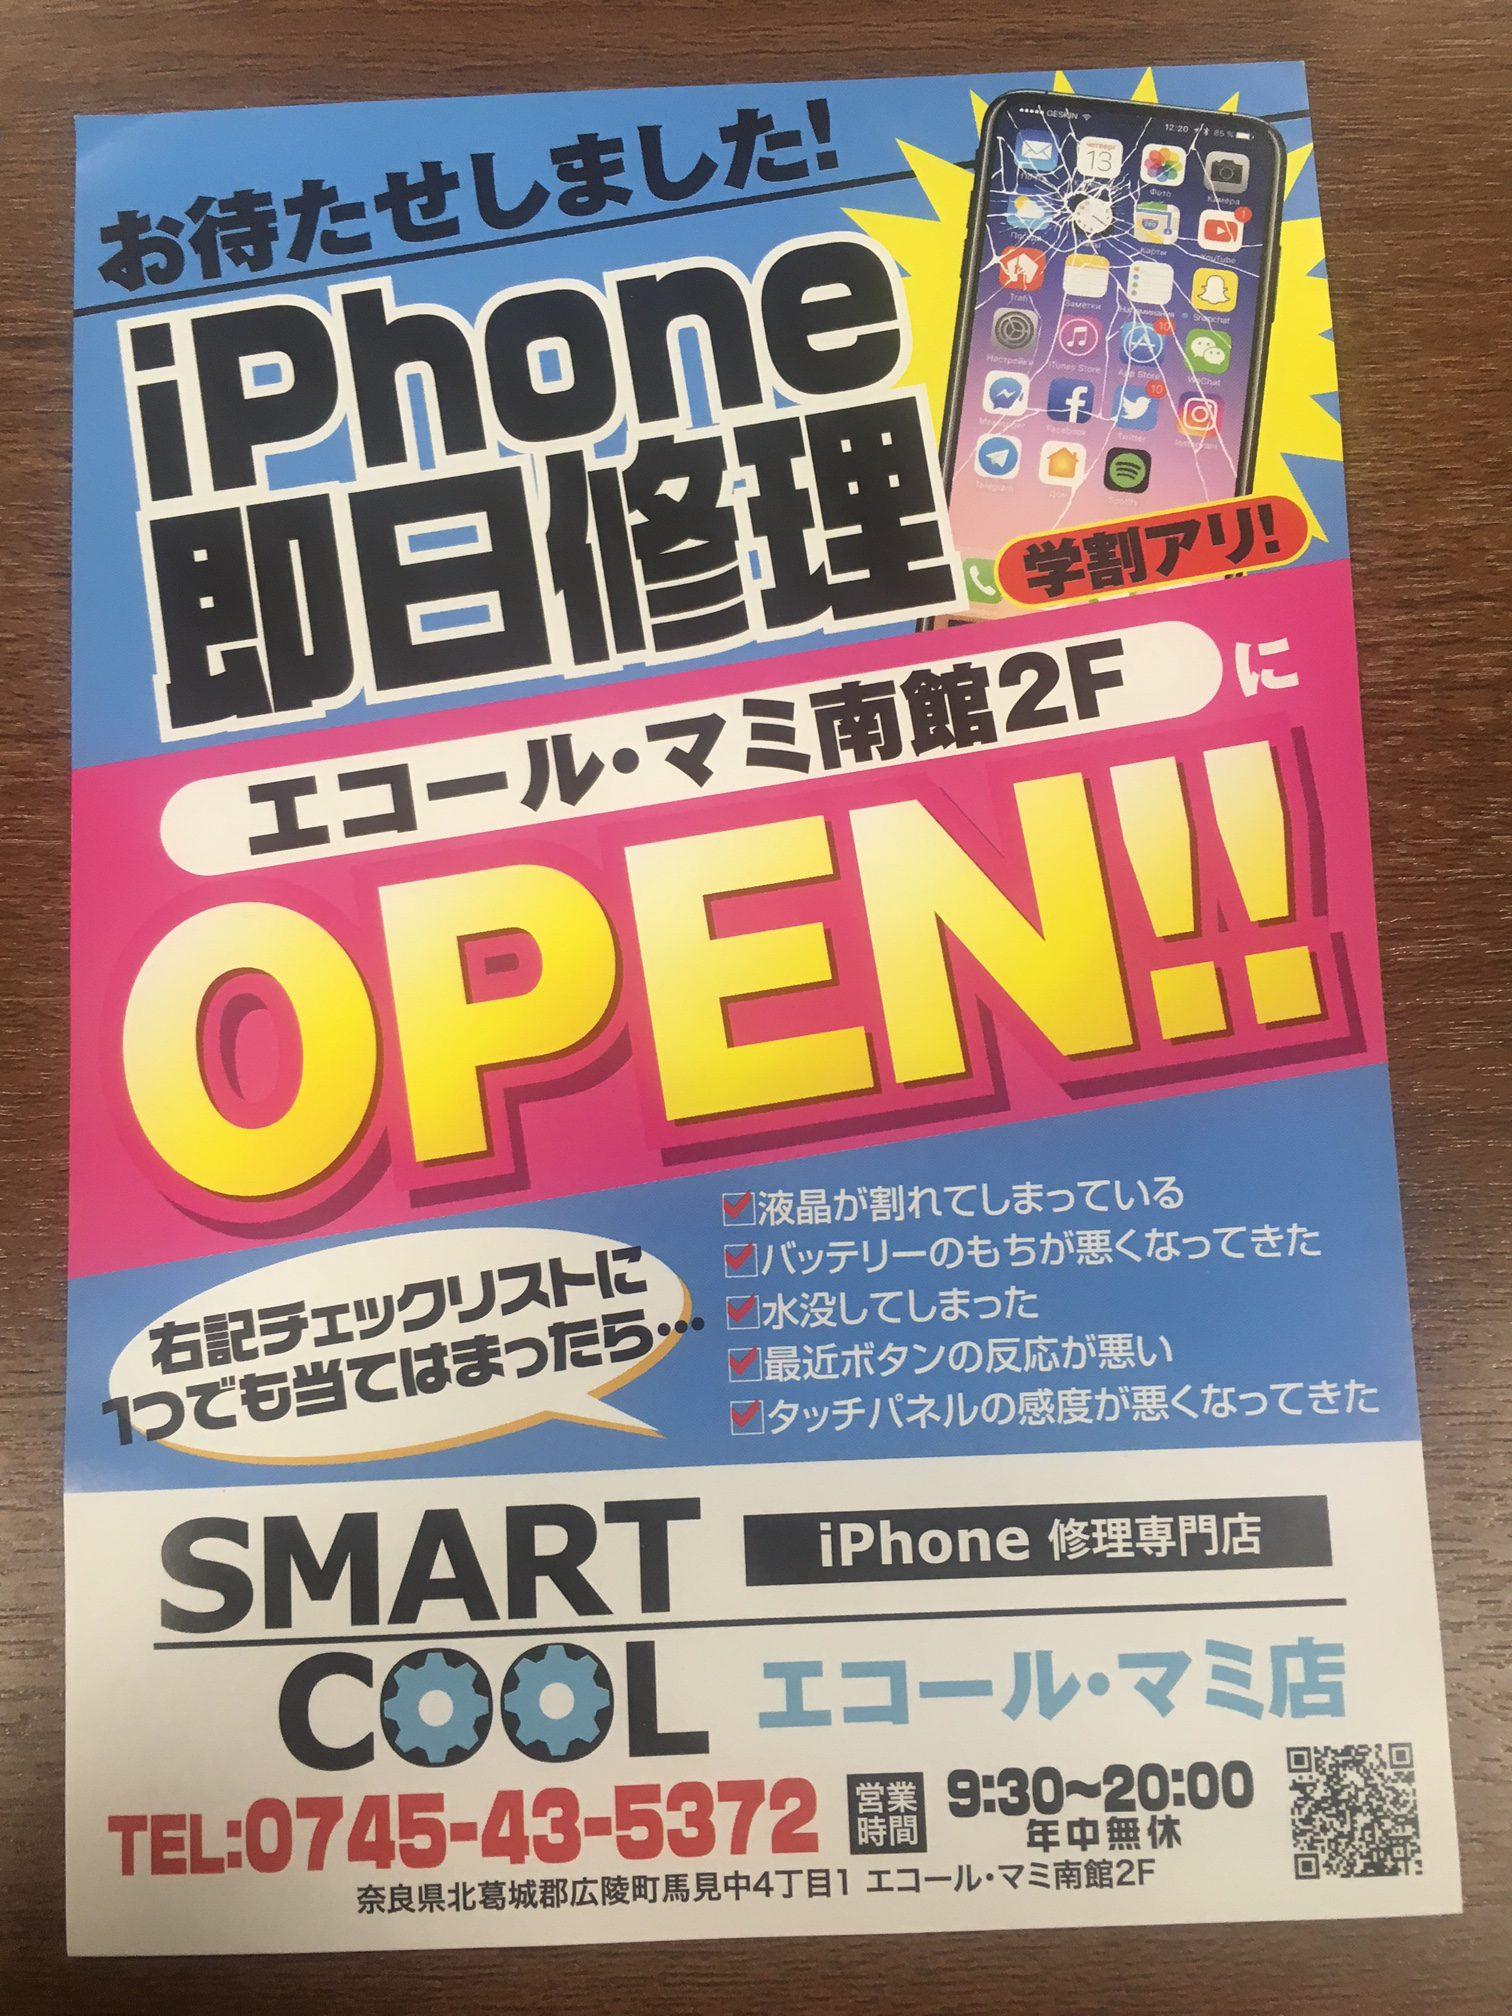 iphoneのトラブルならスマートクール エコール・マミ店におまかせ(香芝市、橿原市、広陵町)<画面の割れ・バッテリーの持ち>